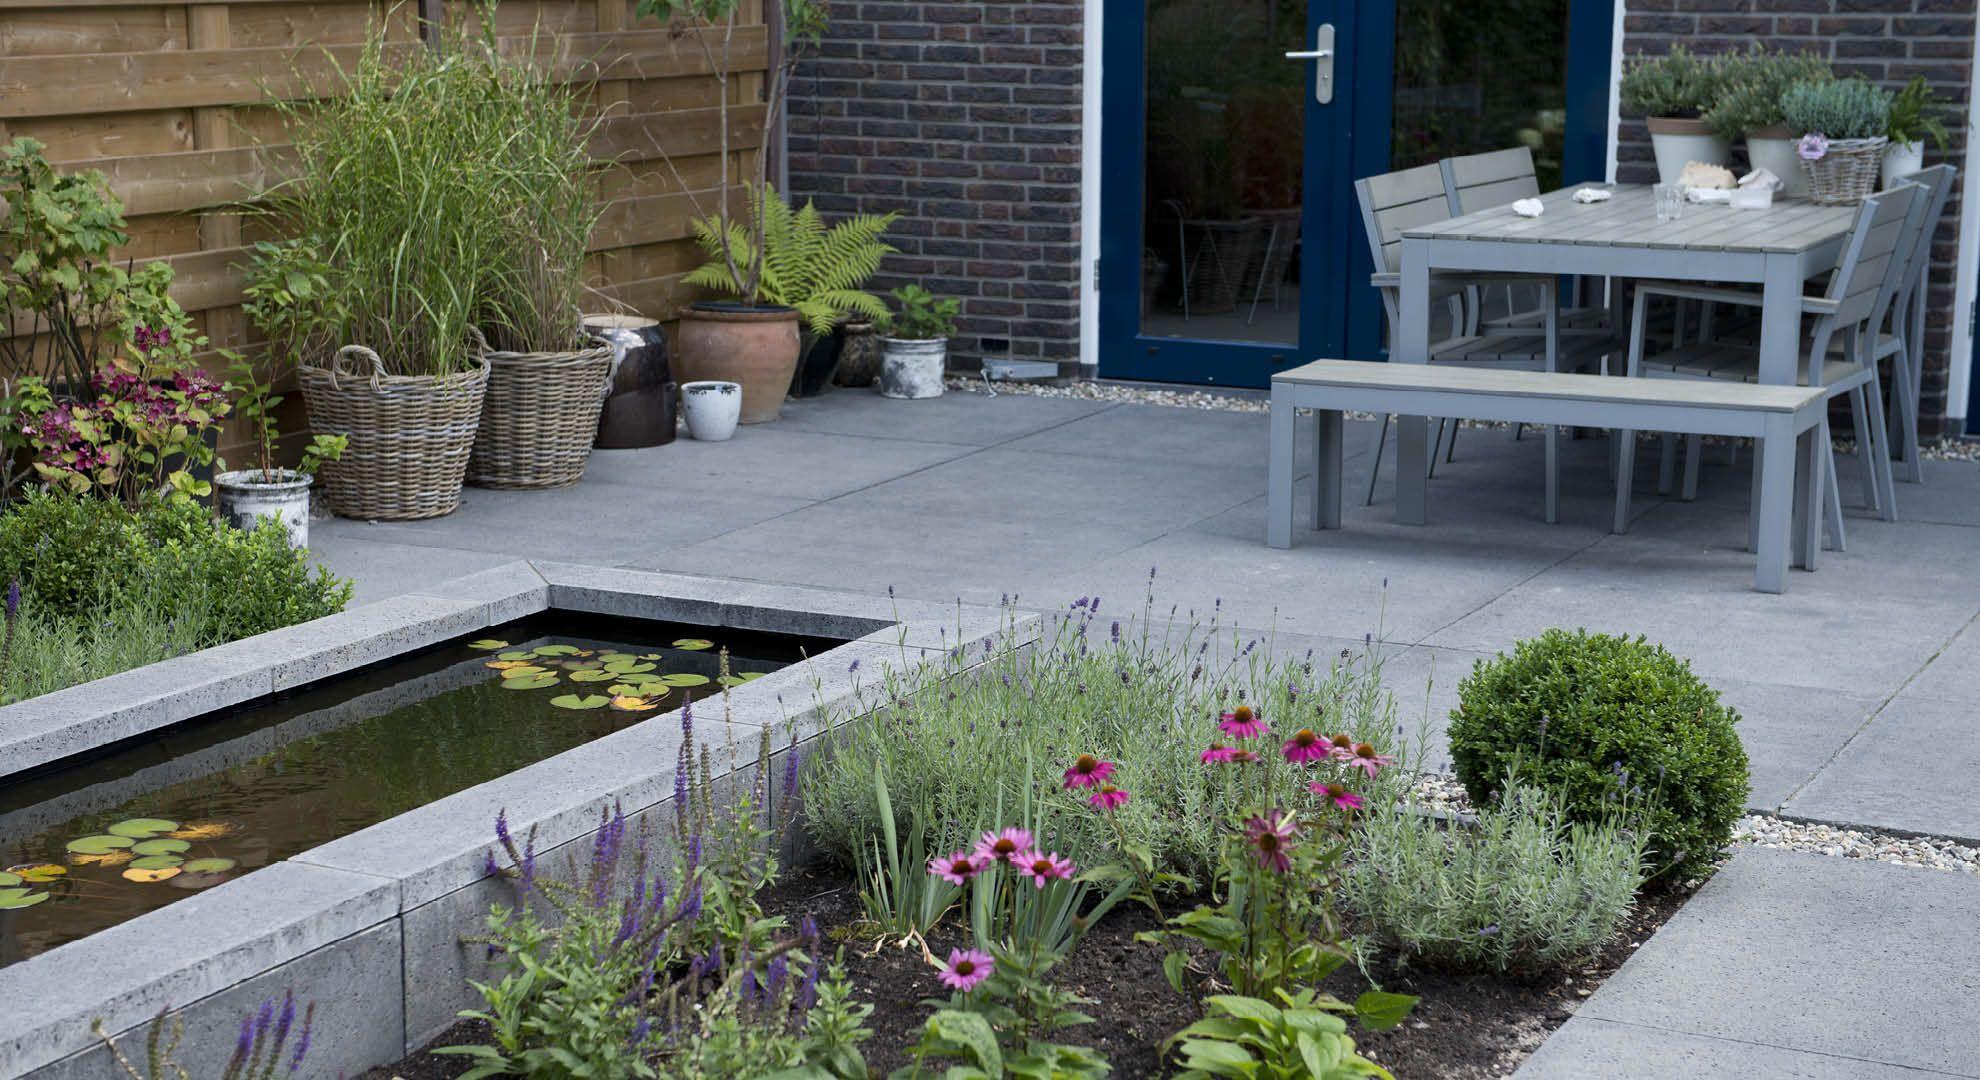 Rodenburg tuinen moderne achtertuin bij een nieuwbouwwoning deze